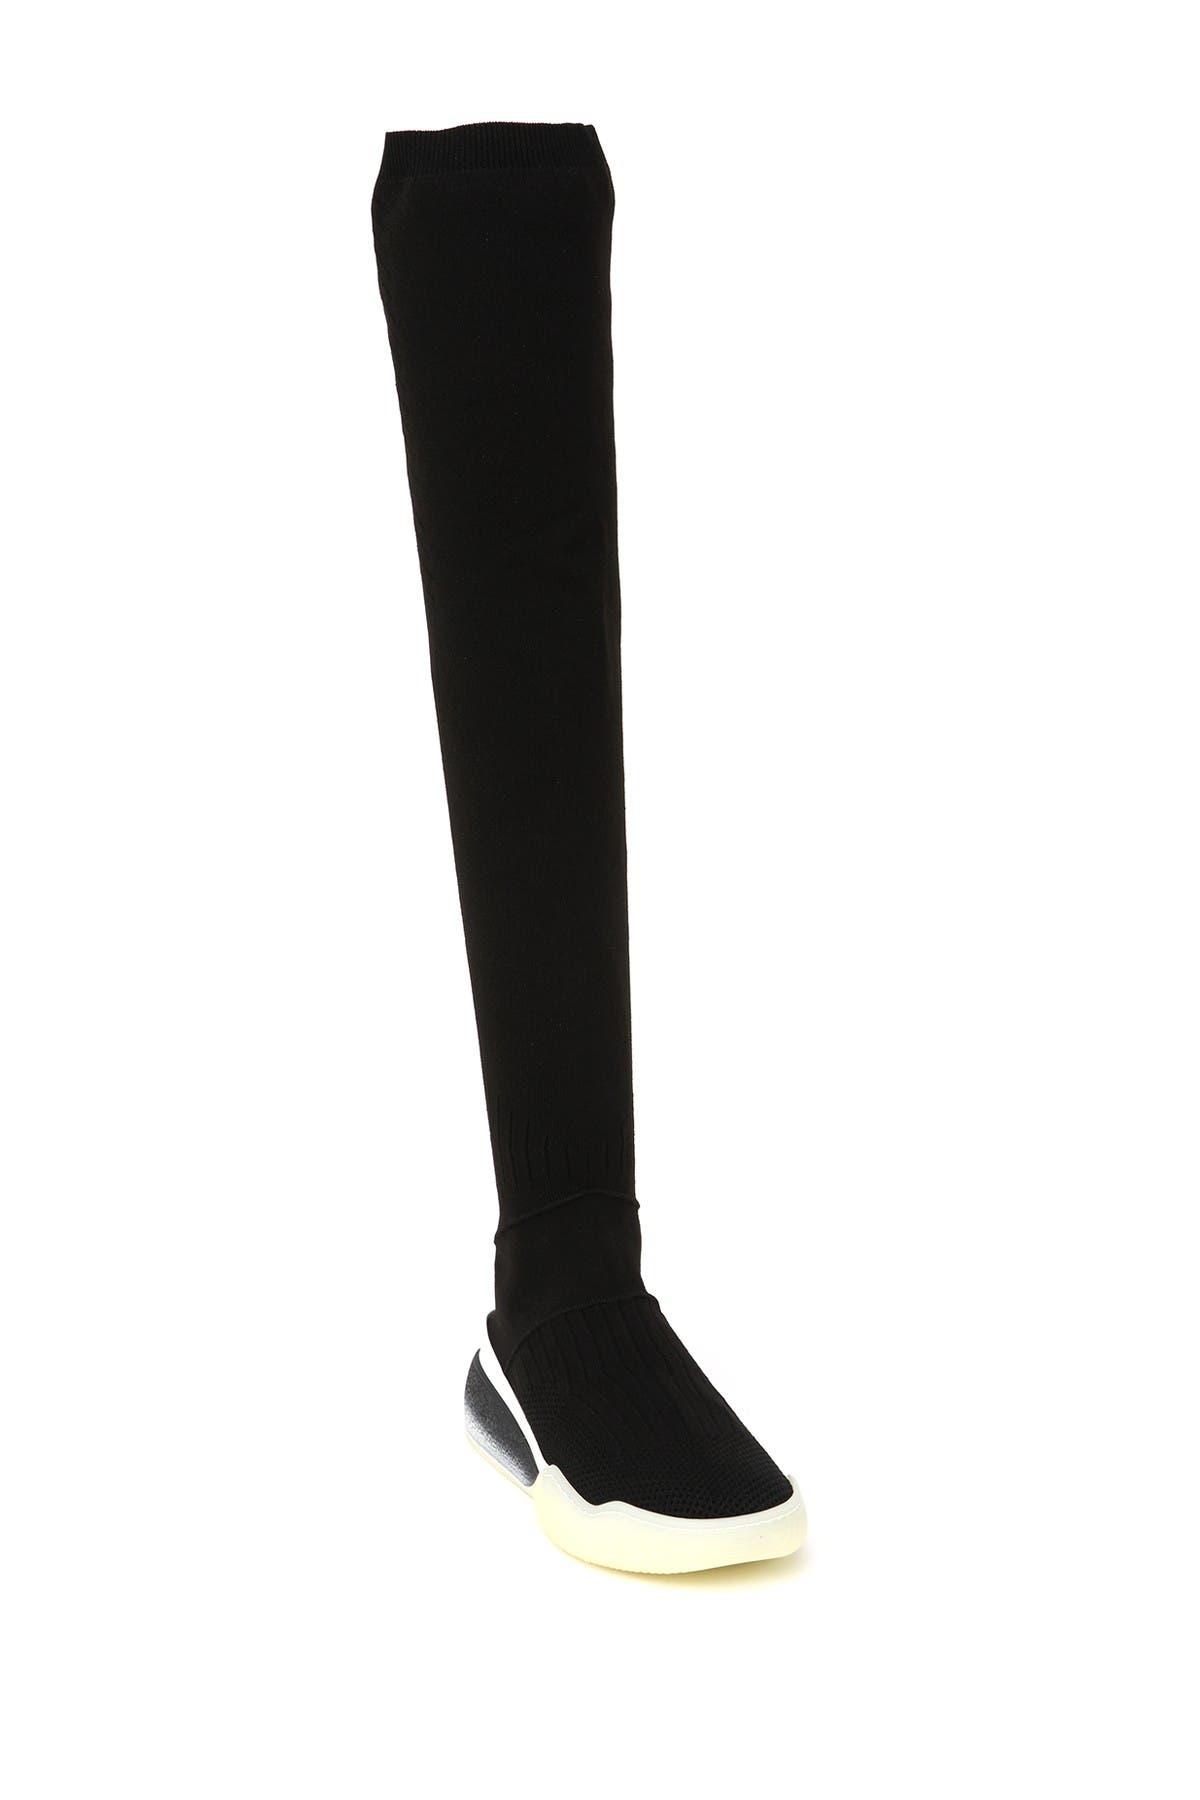 Image of Stella McCartney Hightop Boot Sneaker